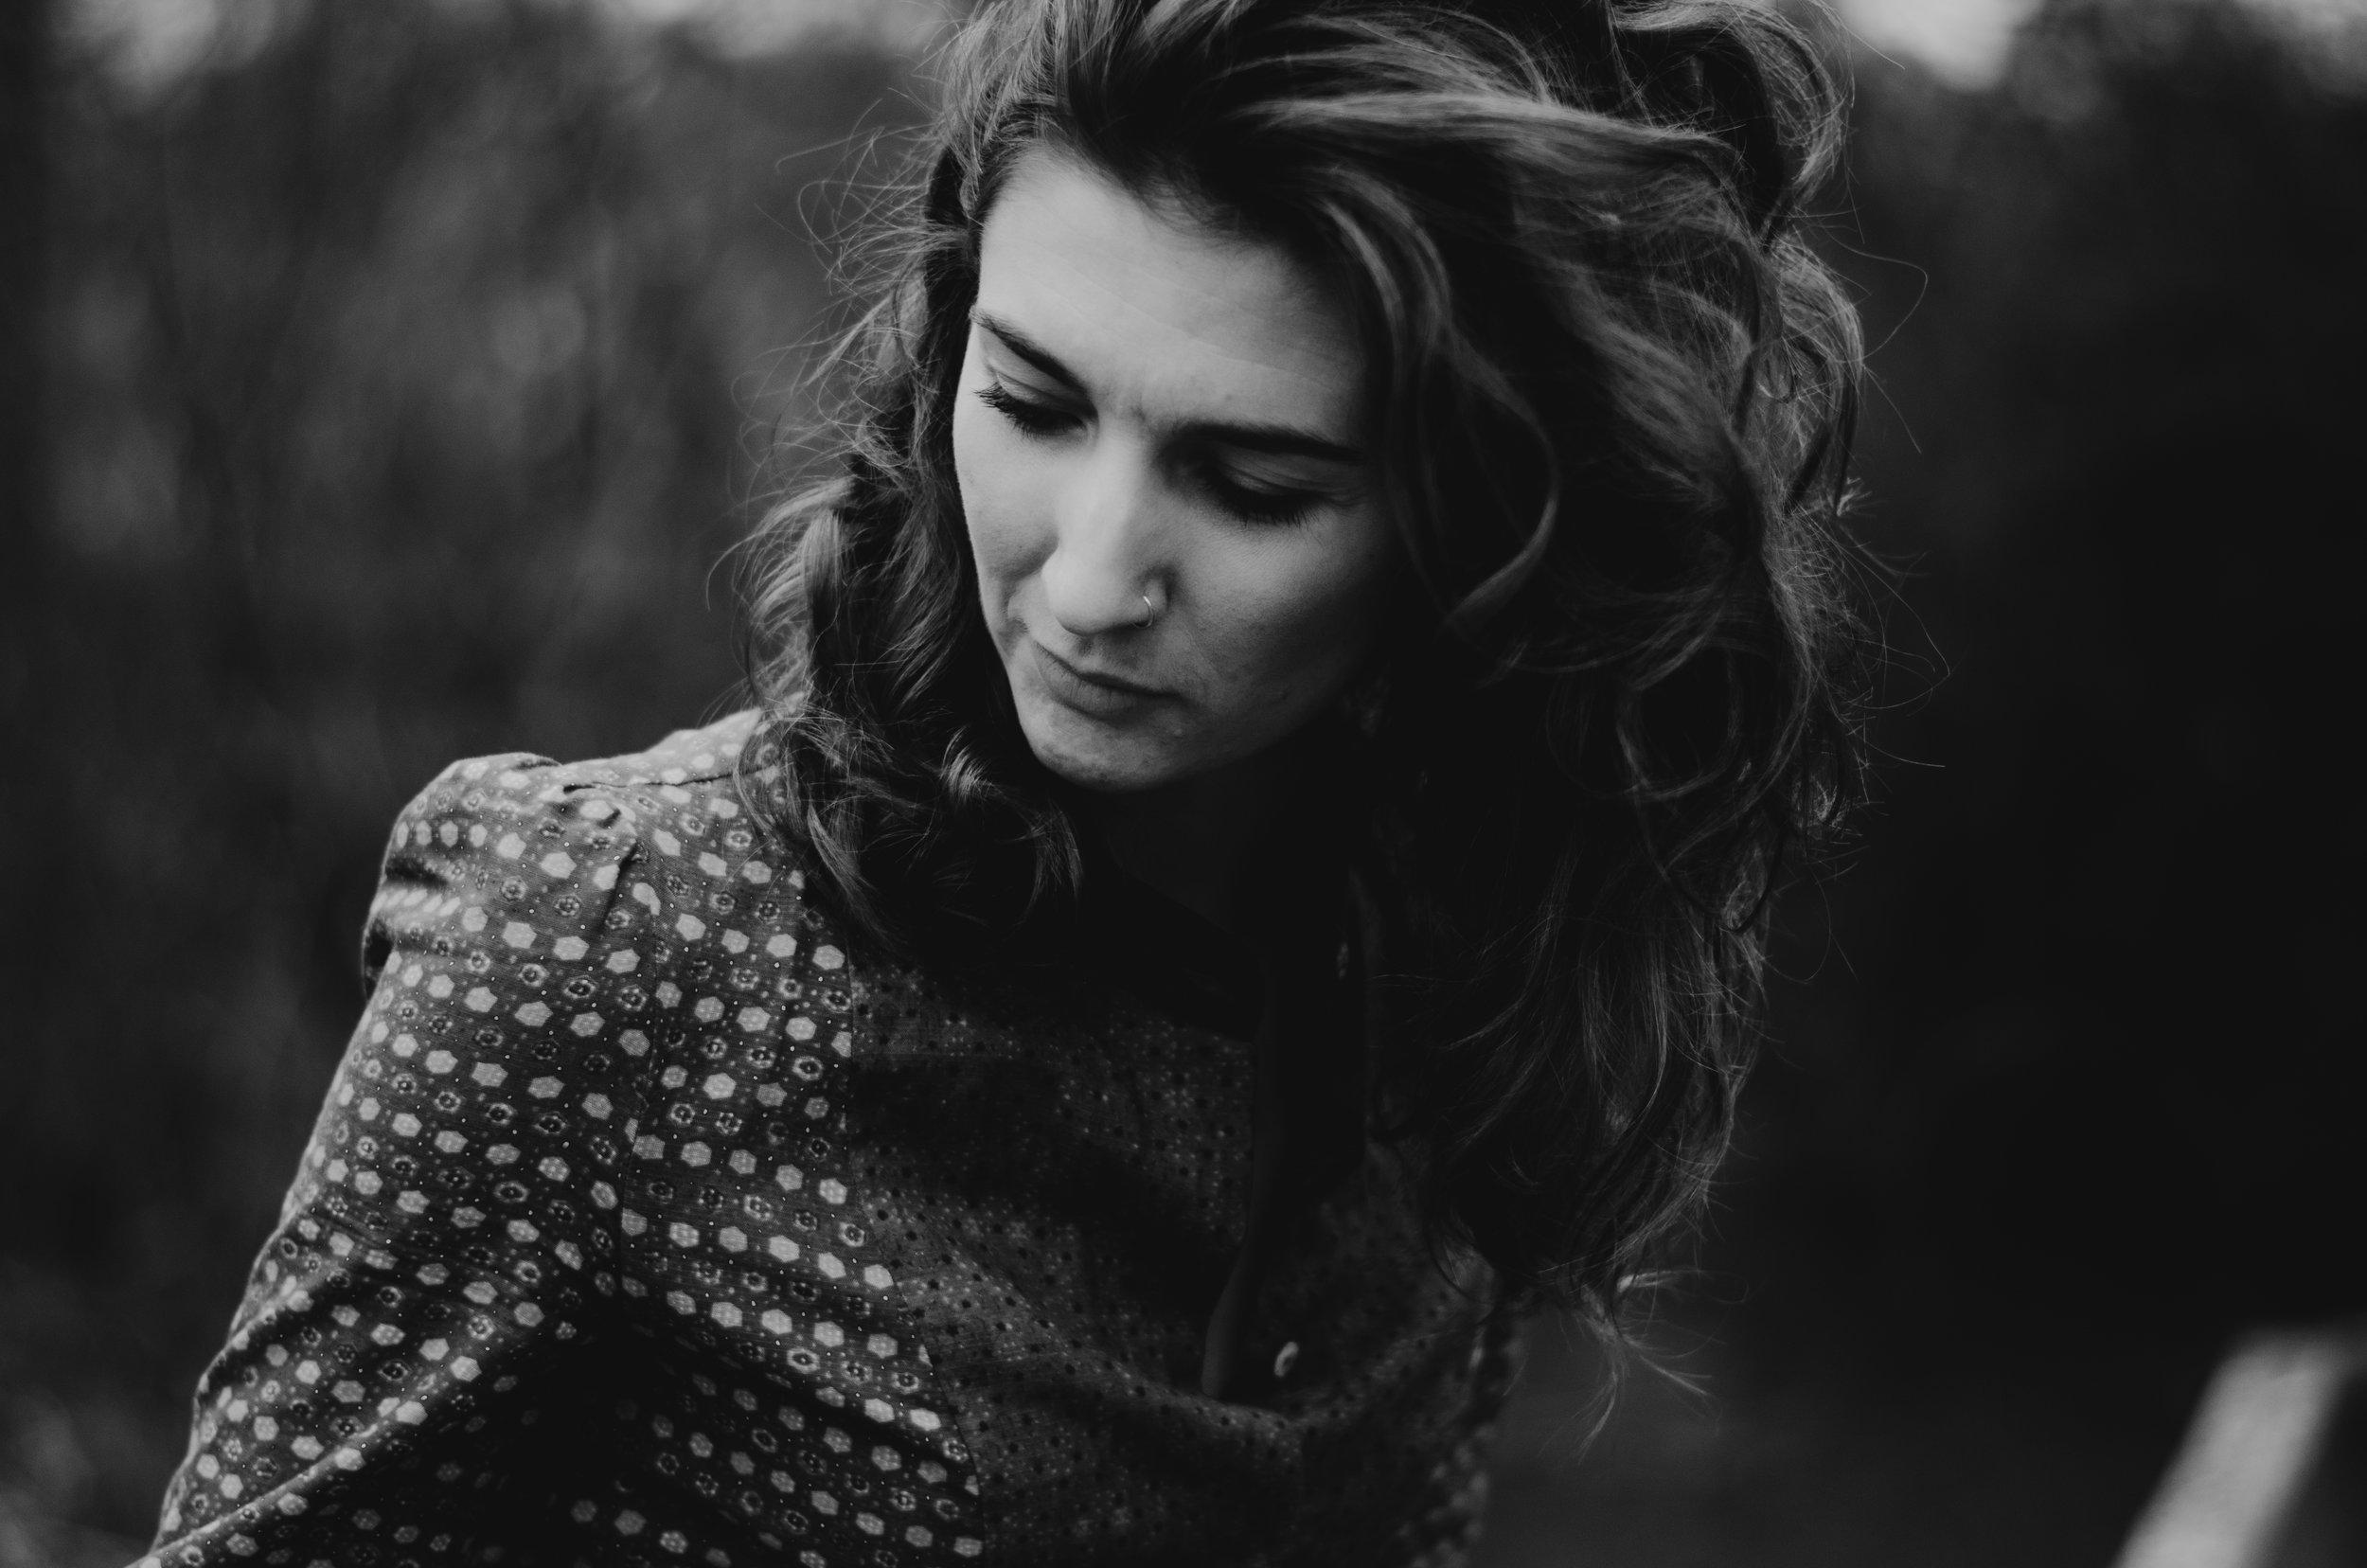 Chloe - Portraits - Aiste Saulyte Photography - 2018-01-05-50.jpg